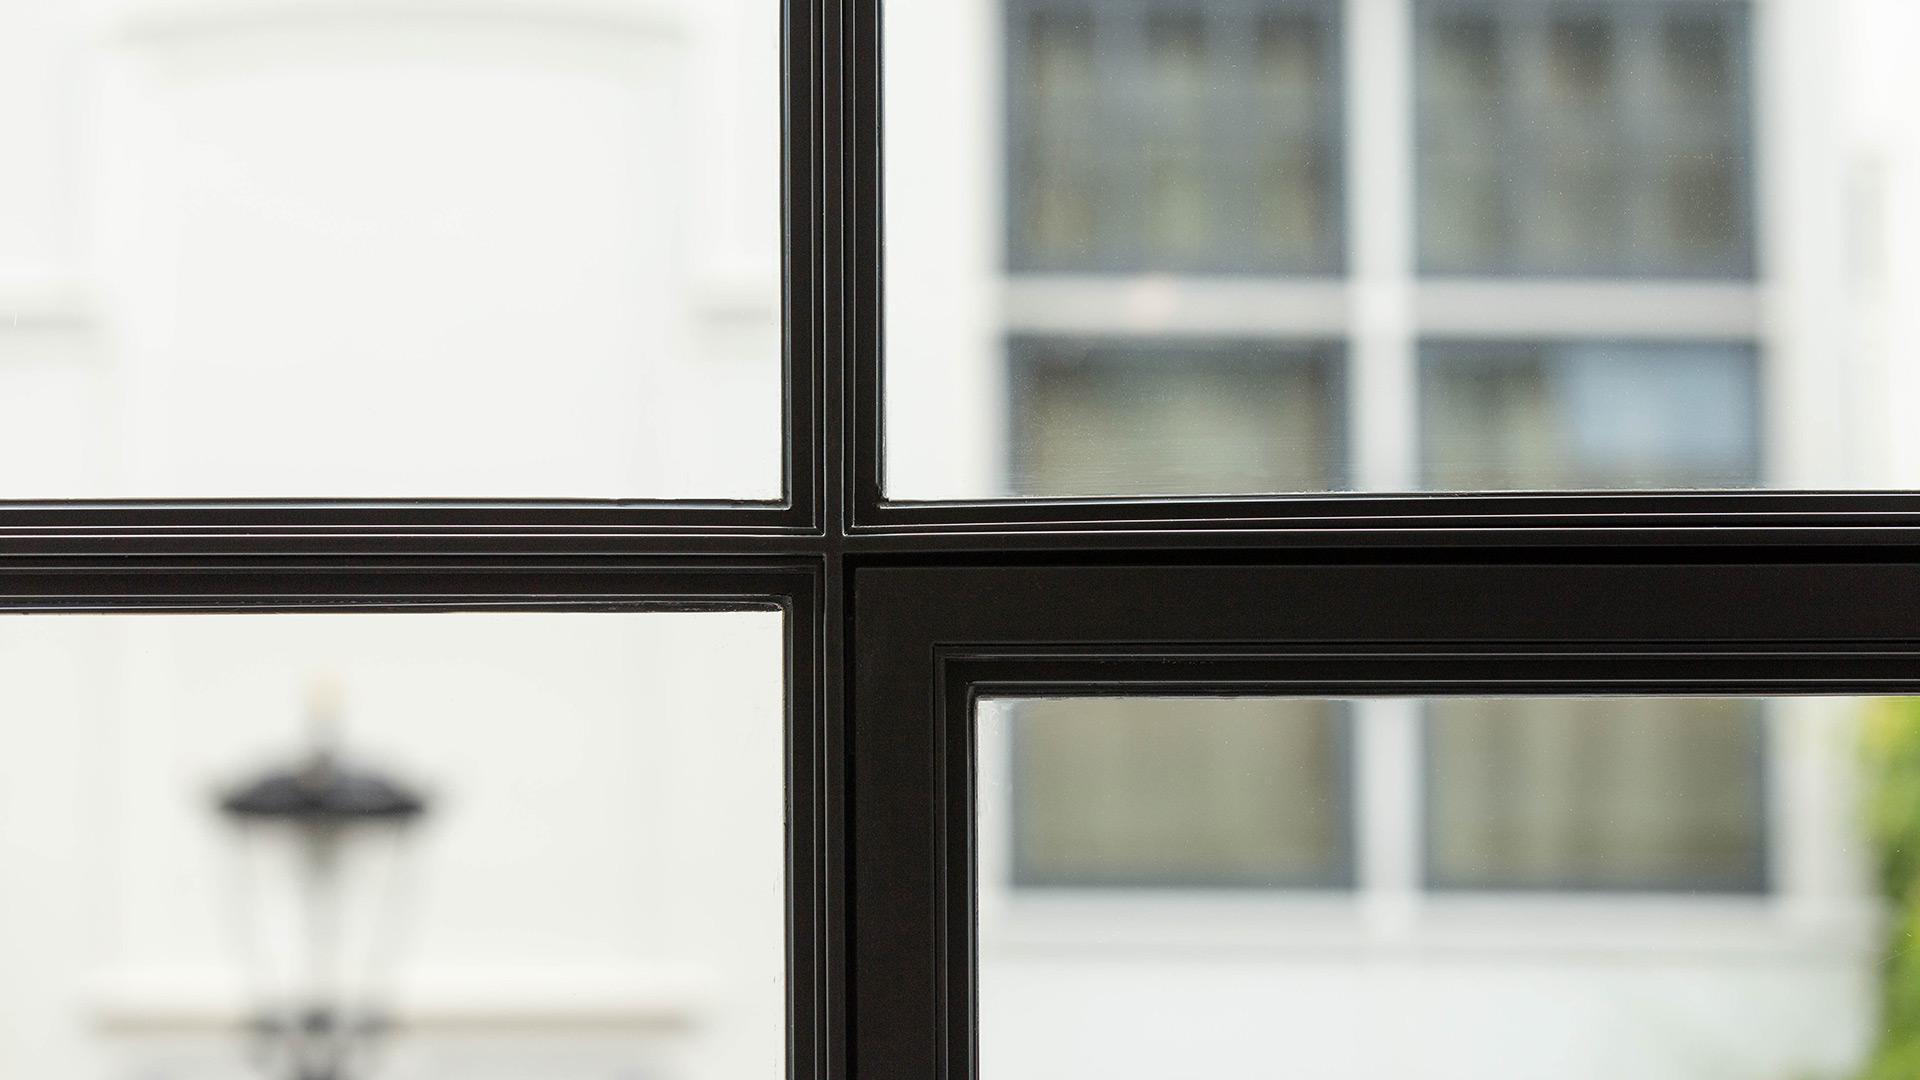 Steel glazed frames